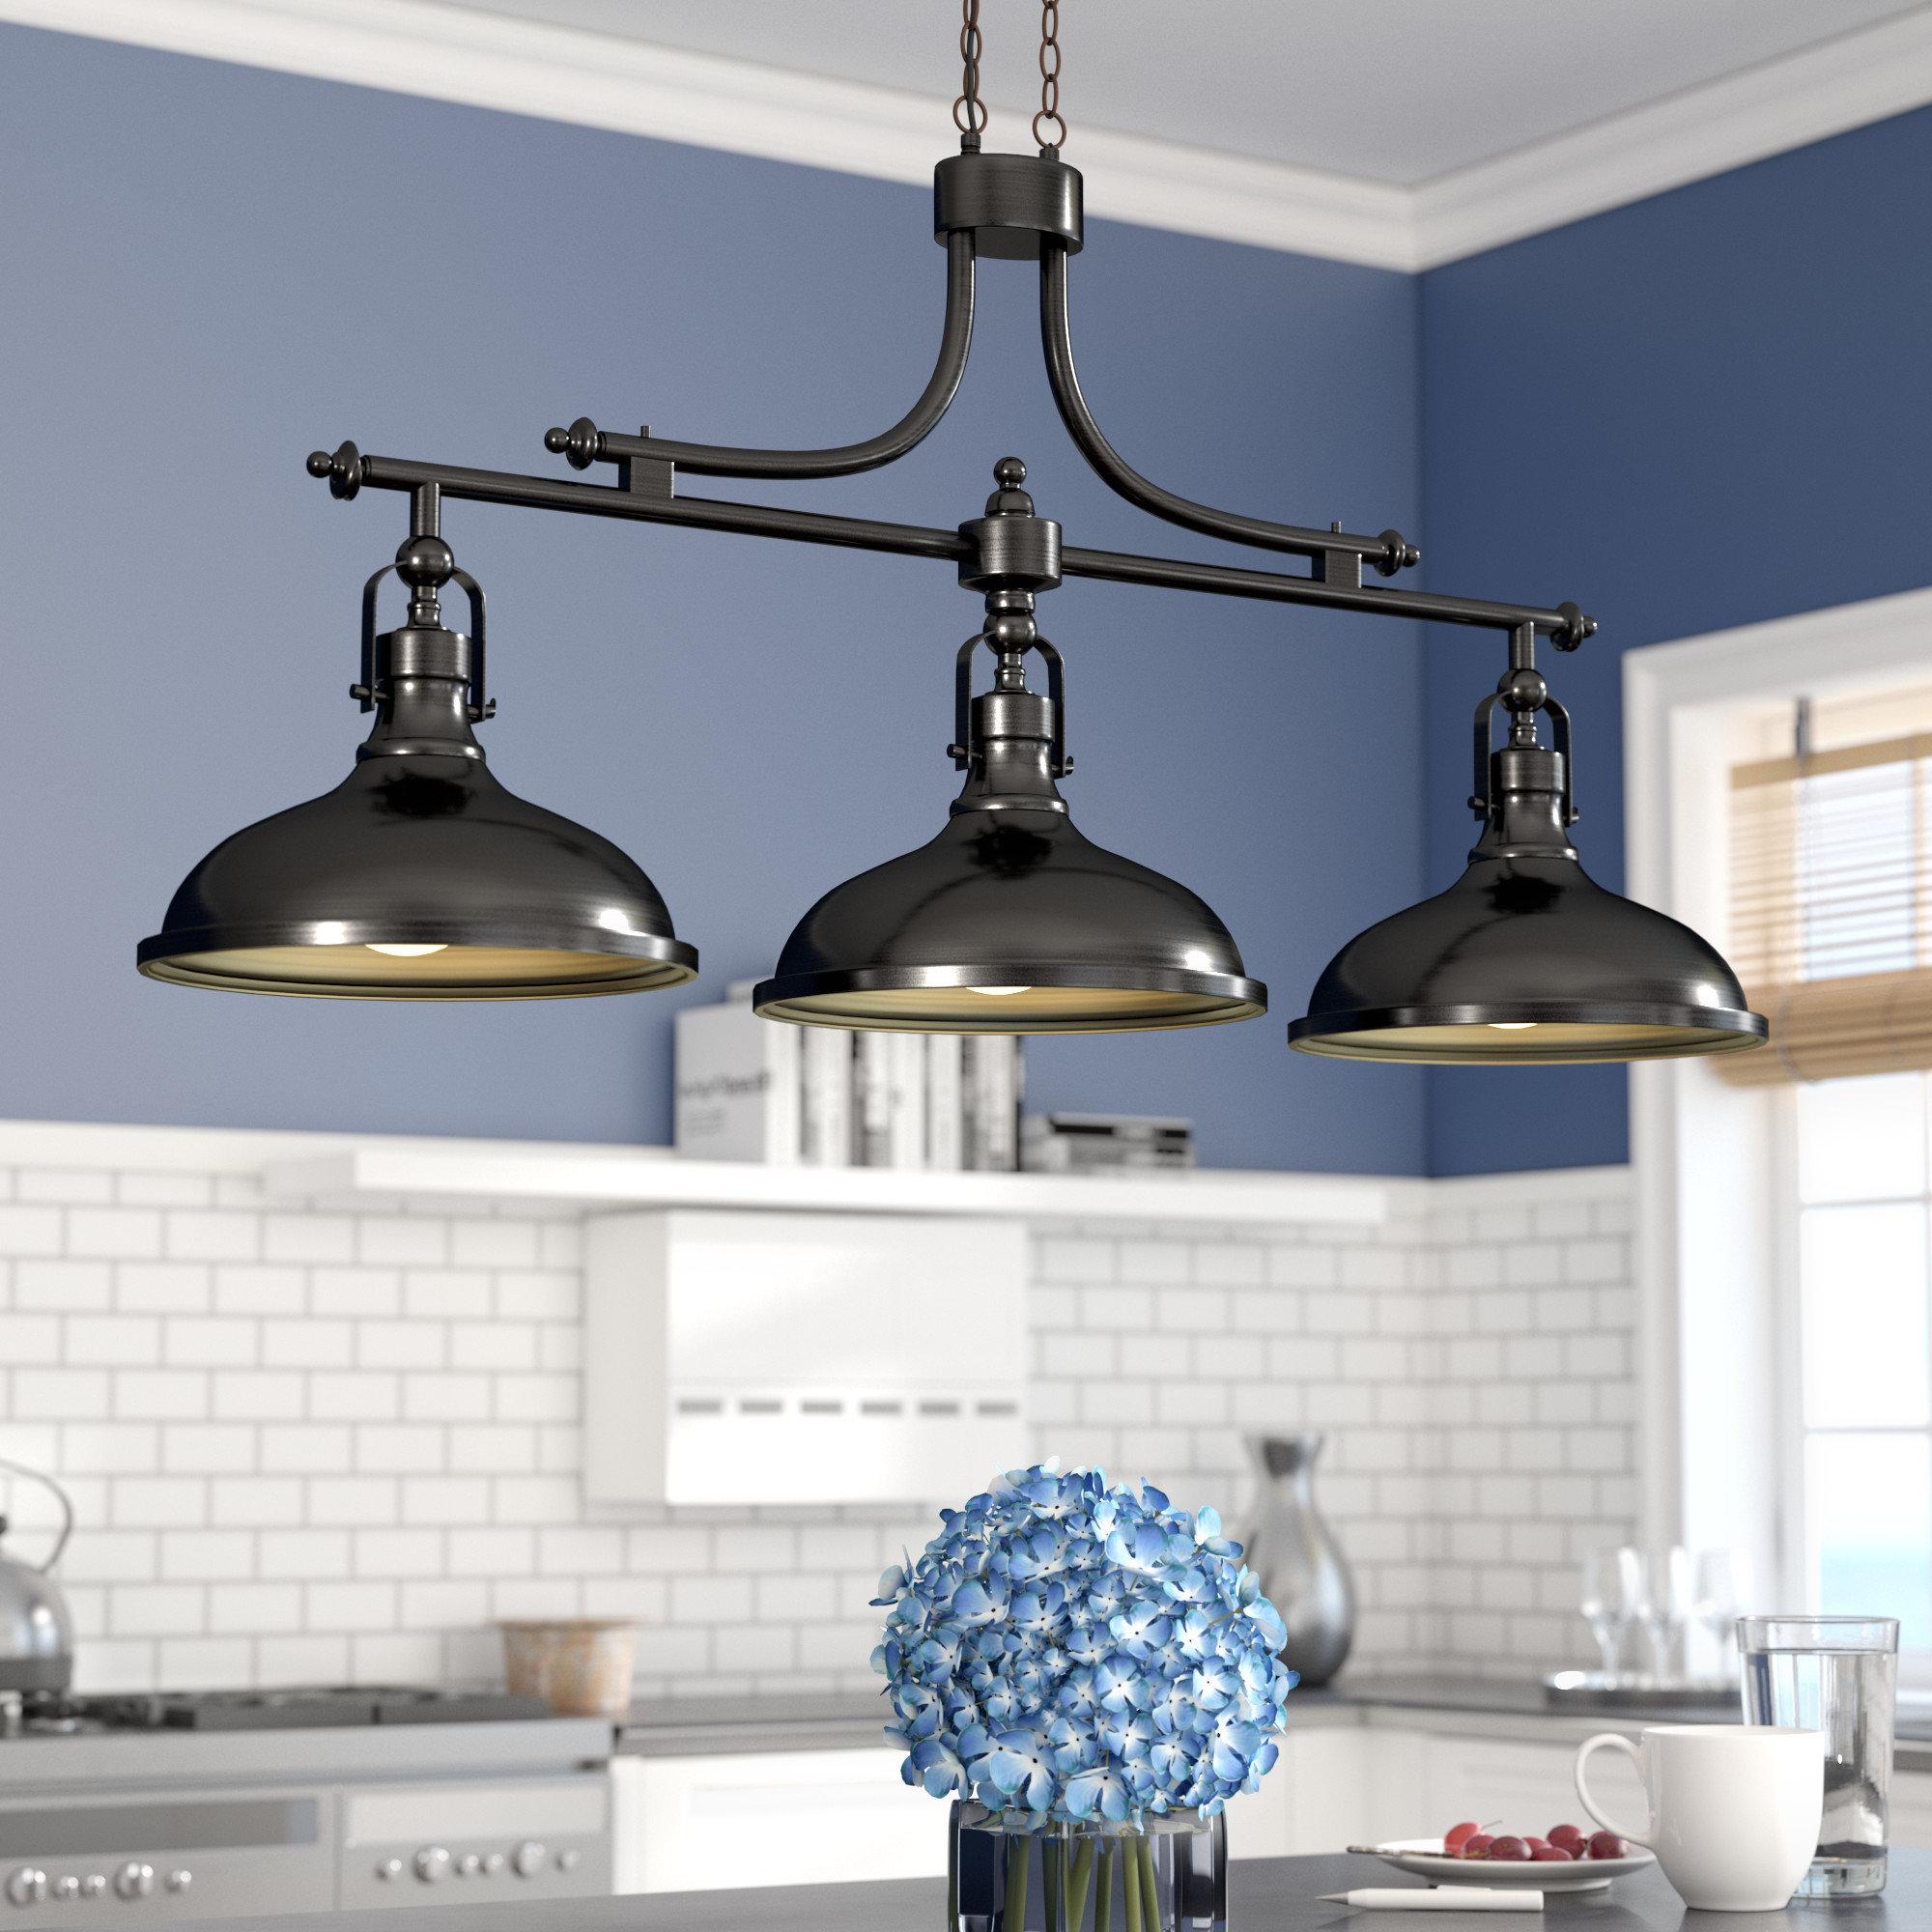 Ariel 3 Light Kitchen Island Dome Pendants Pertaining To Trendy Kitchen Island Pendant Lighting Fixtures – Gnubies (View 8 of 25)